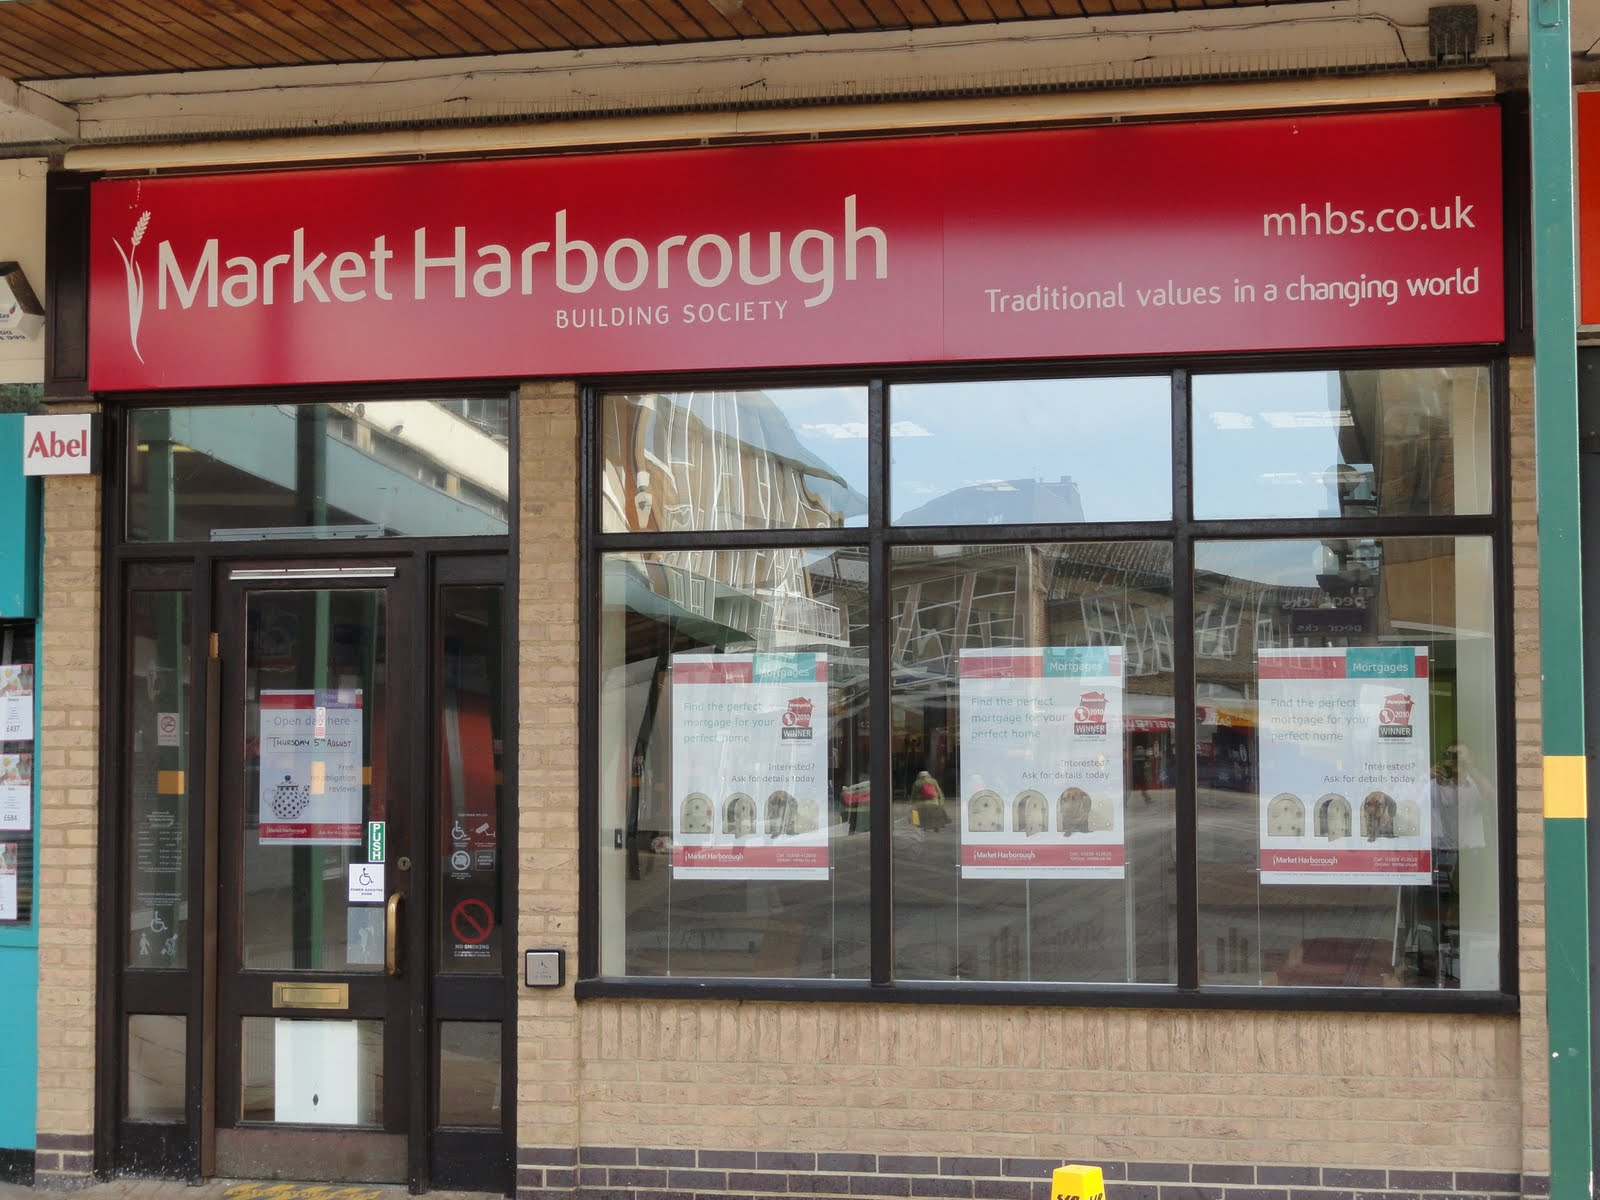 Market Harborough Building Society Ltd